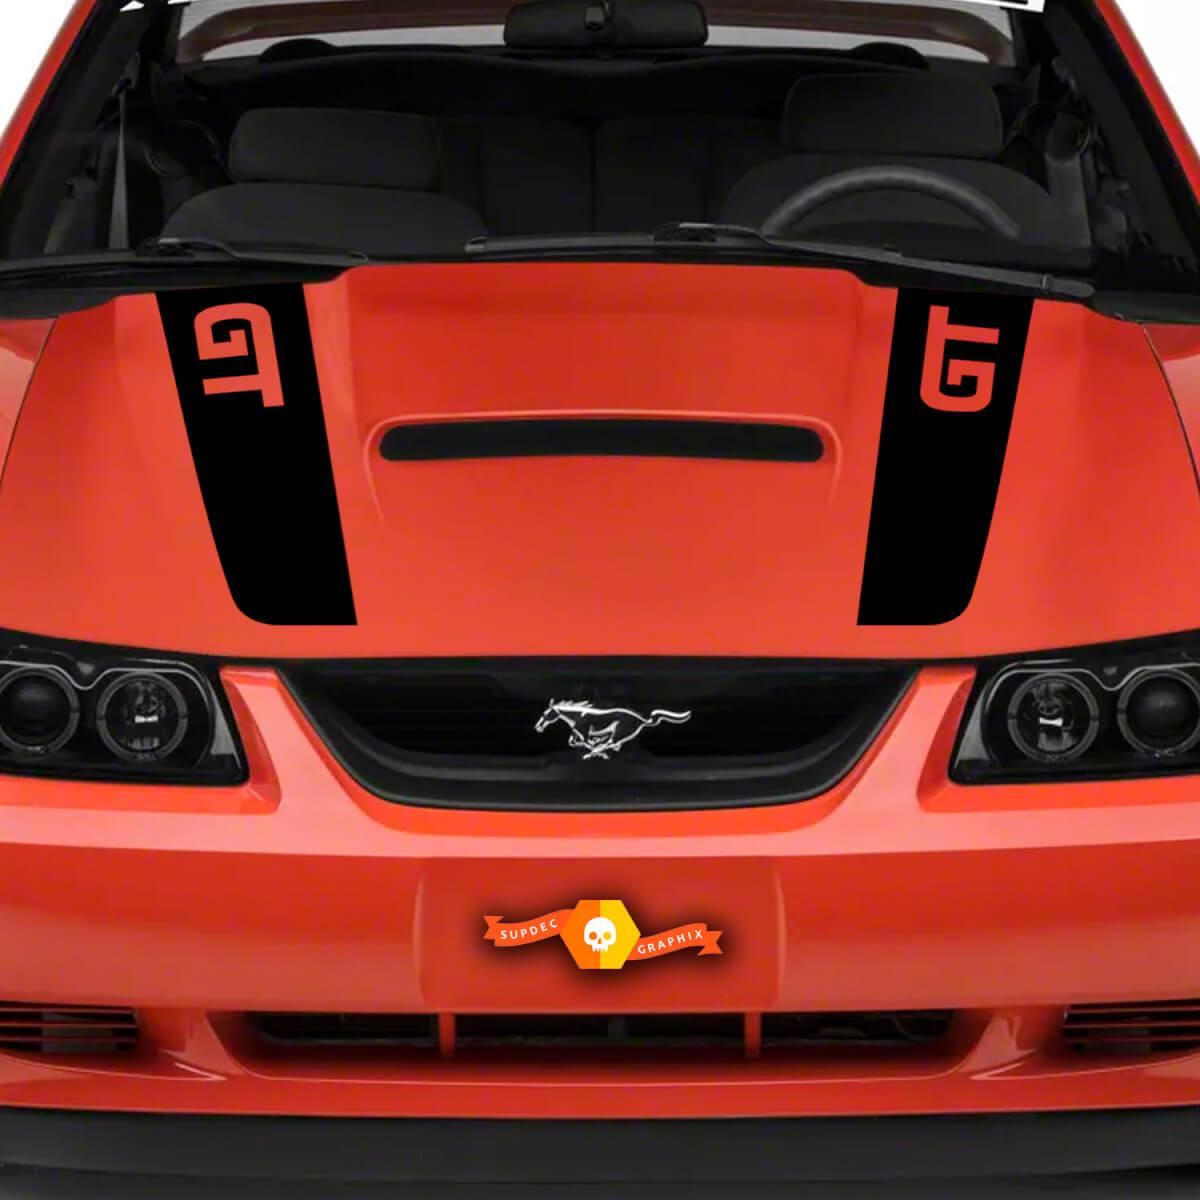 1999 - 2004 Ford Mustang GT Haubenstreifen Aufkleber Fox Body Beliebige Farbe